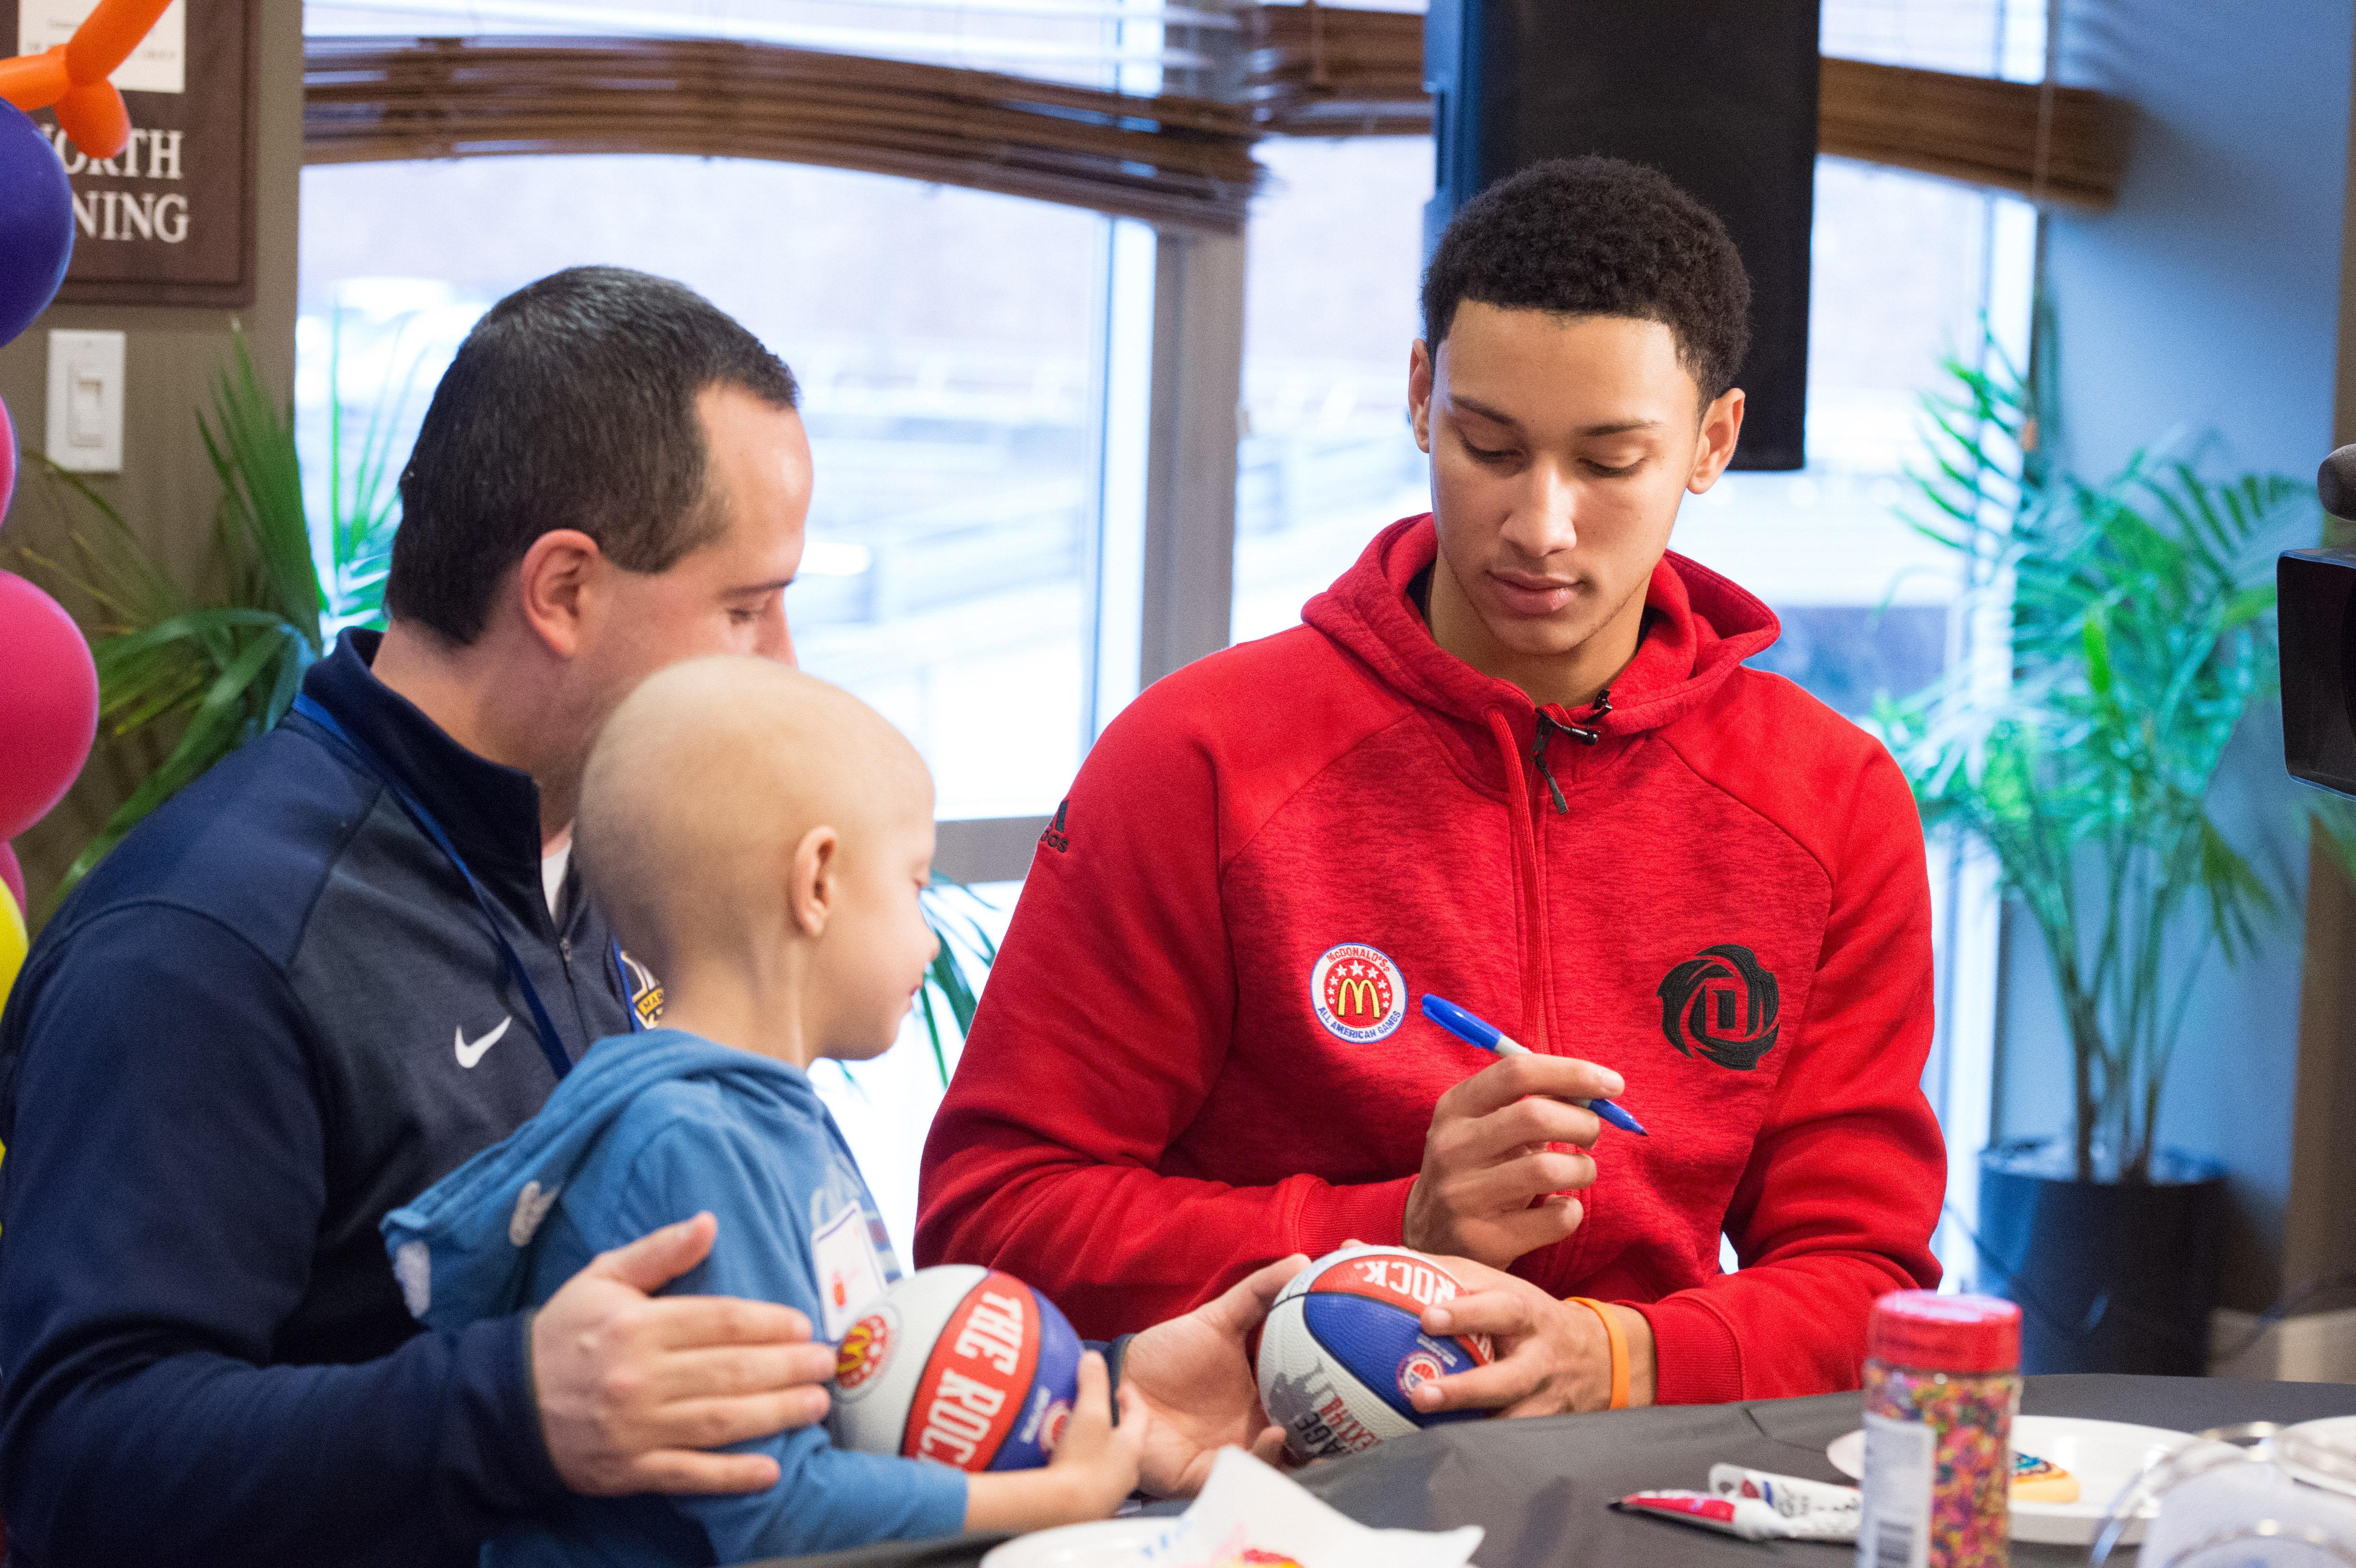 McDonalds HIgh School All American Ben Simmons visits at the Ronald McDonald House (Photo: Matt Hernandez, USA TODAY Sports)